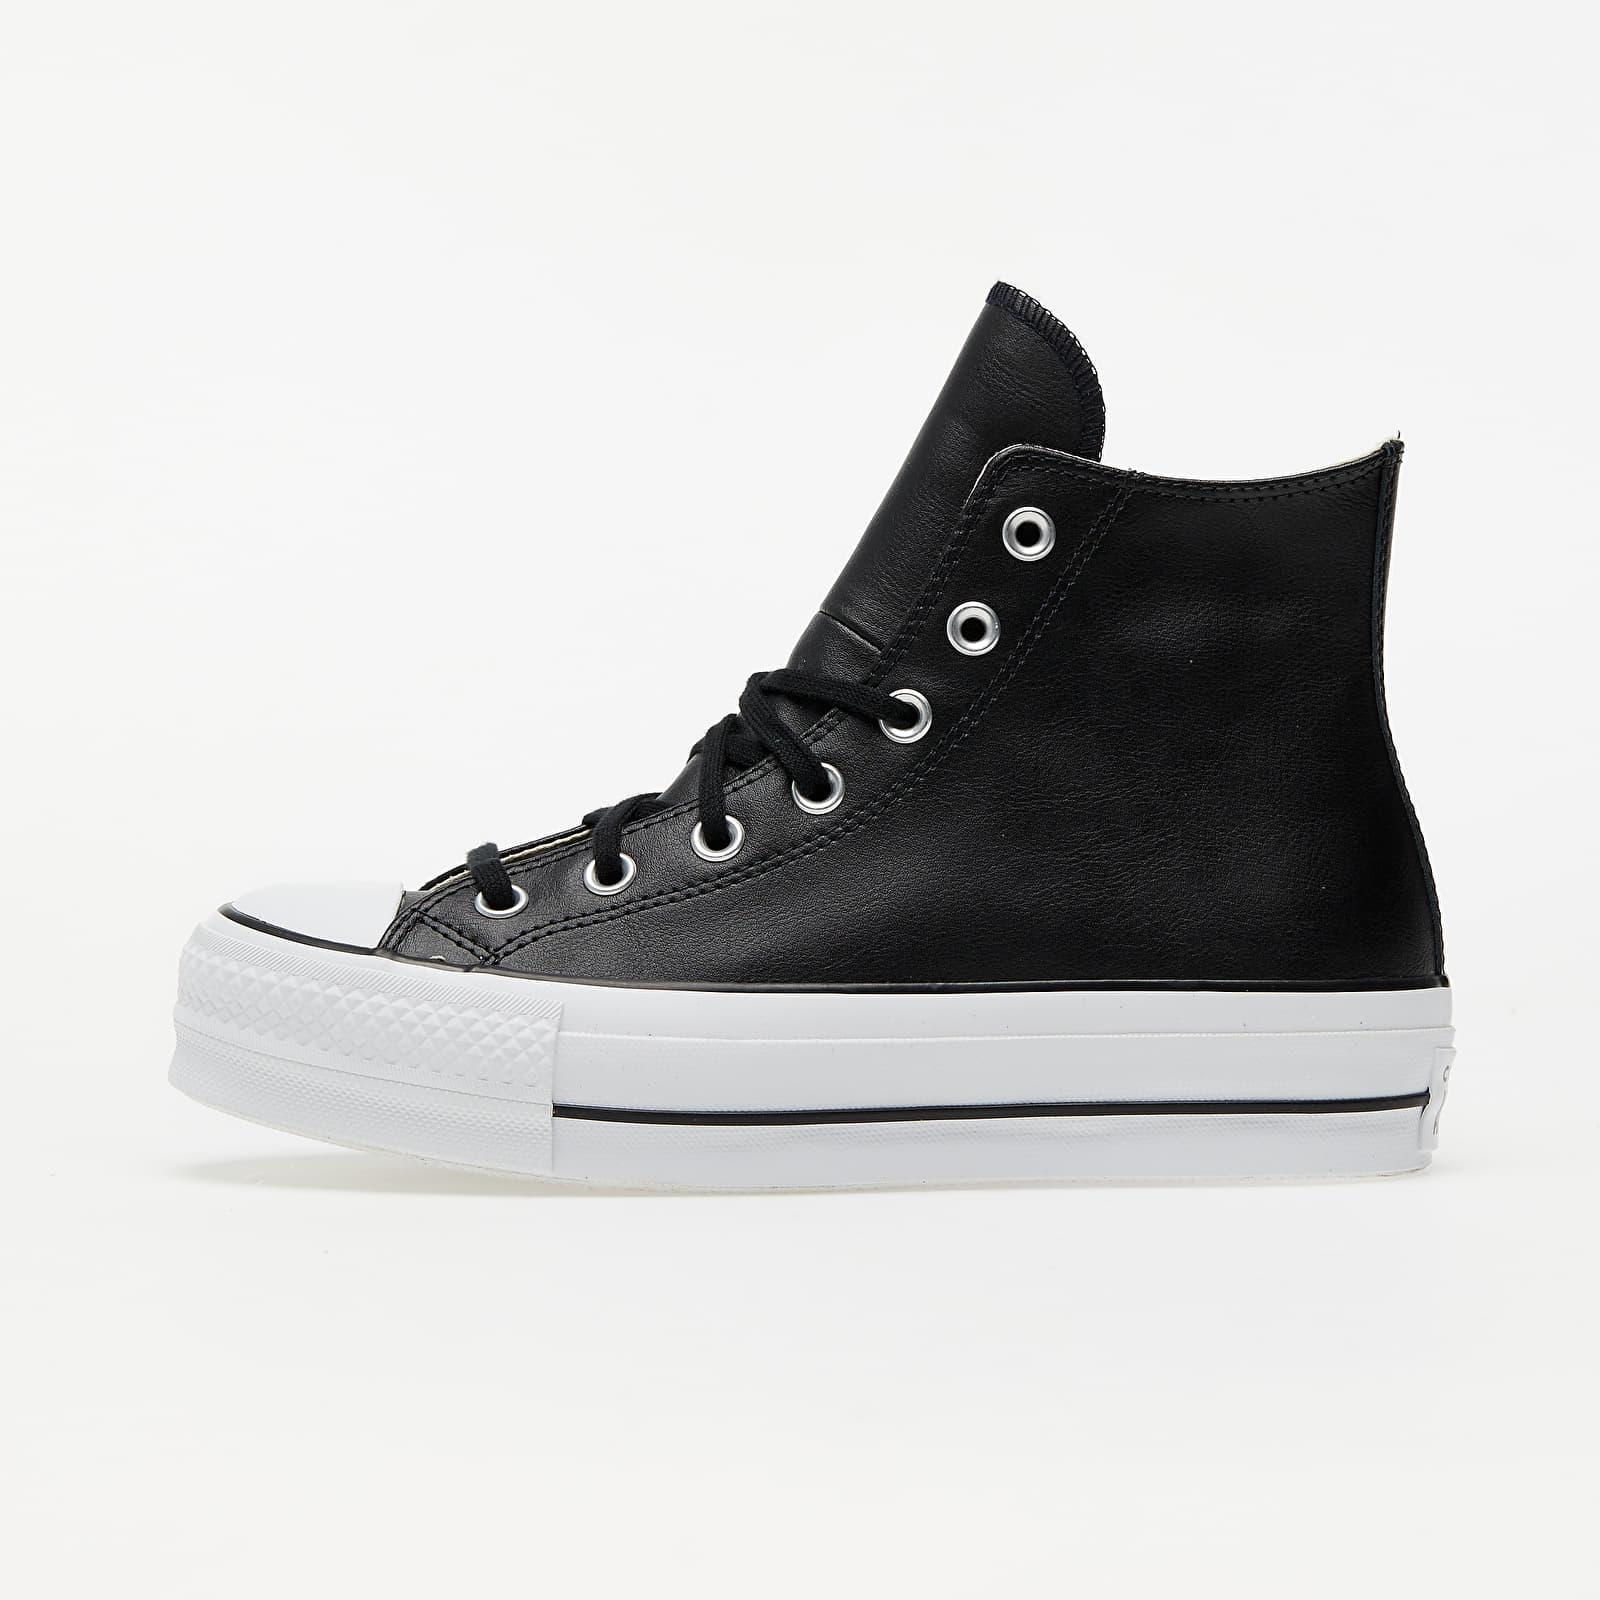 Converse Chuck Taylor All Star Lift Clean Black/ Black/ White 561675C